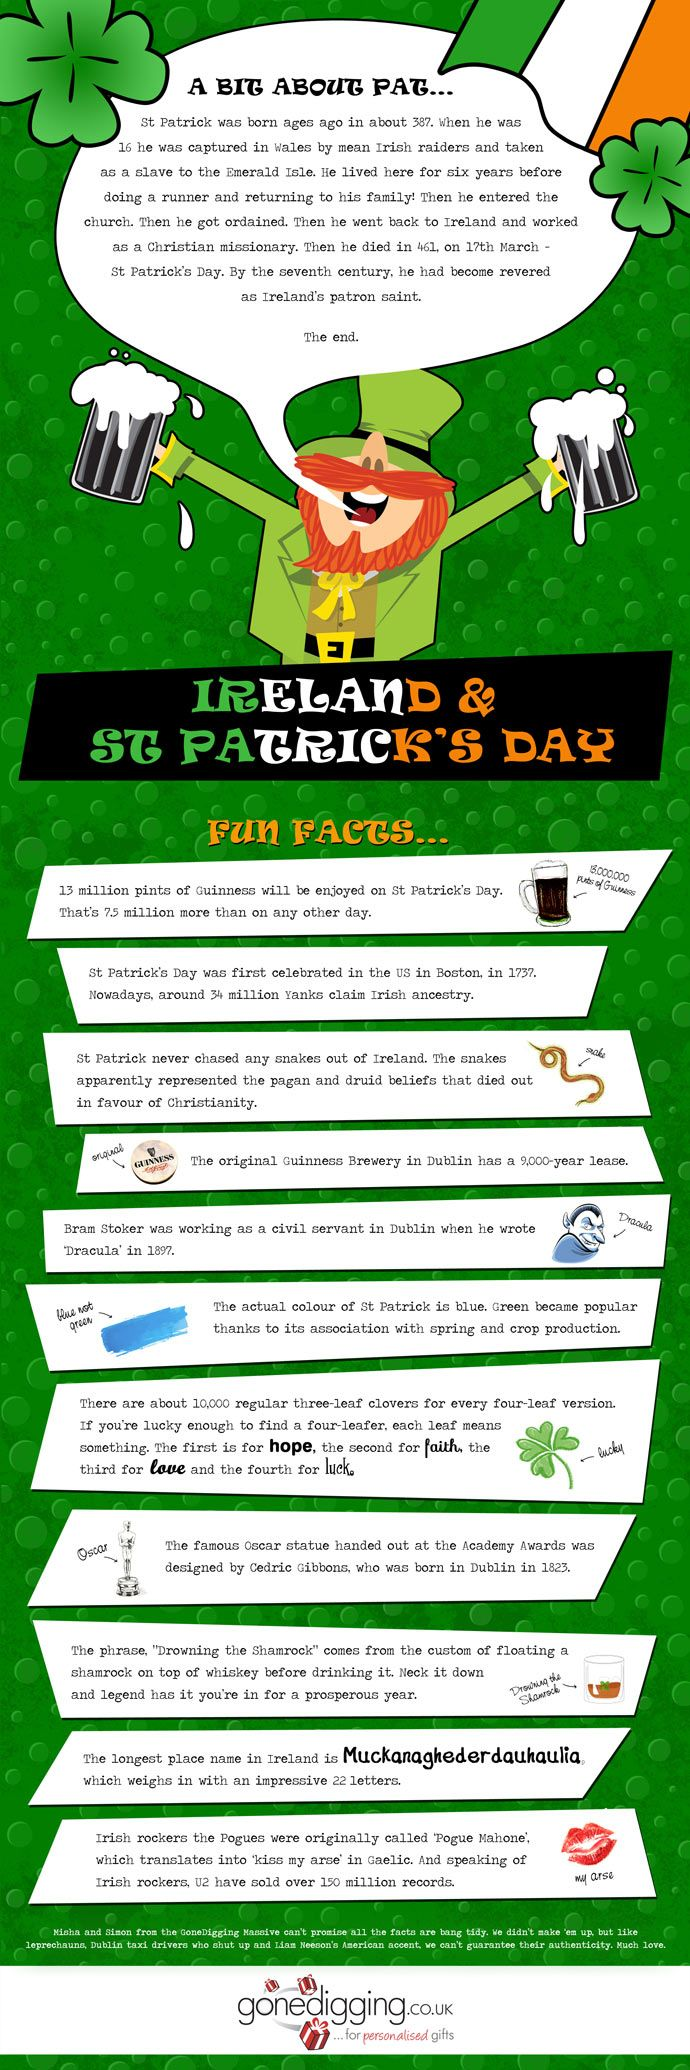 #Ireland and St. Patrick's Day #Patrick